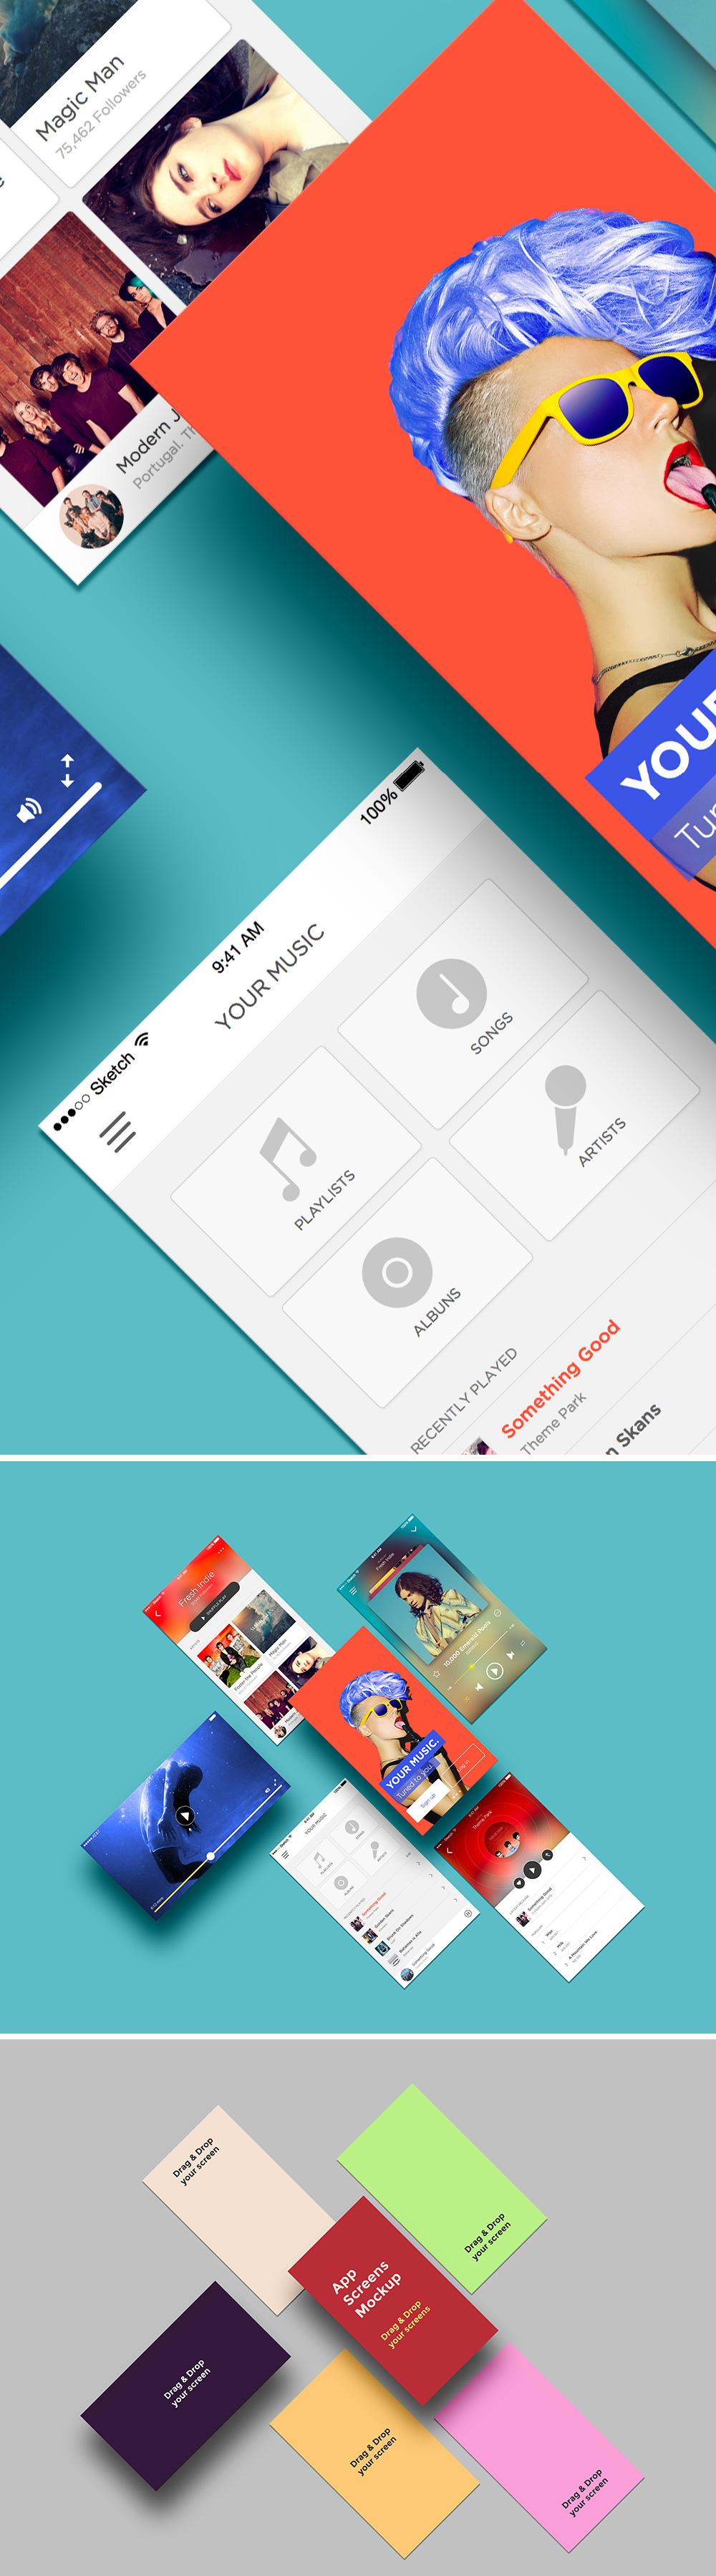 App Screens Mockup